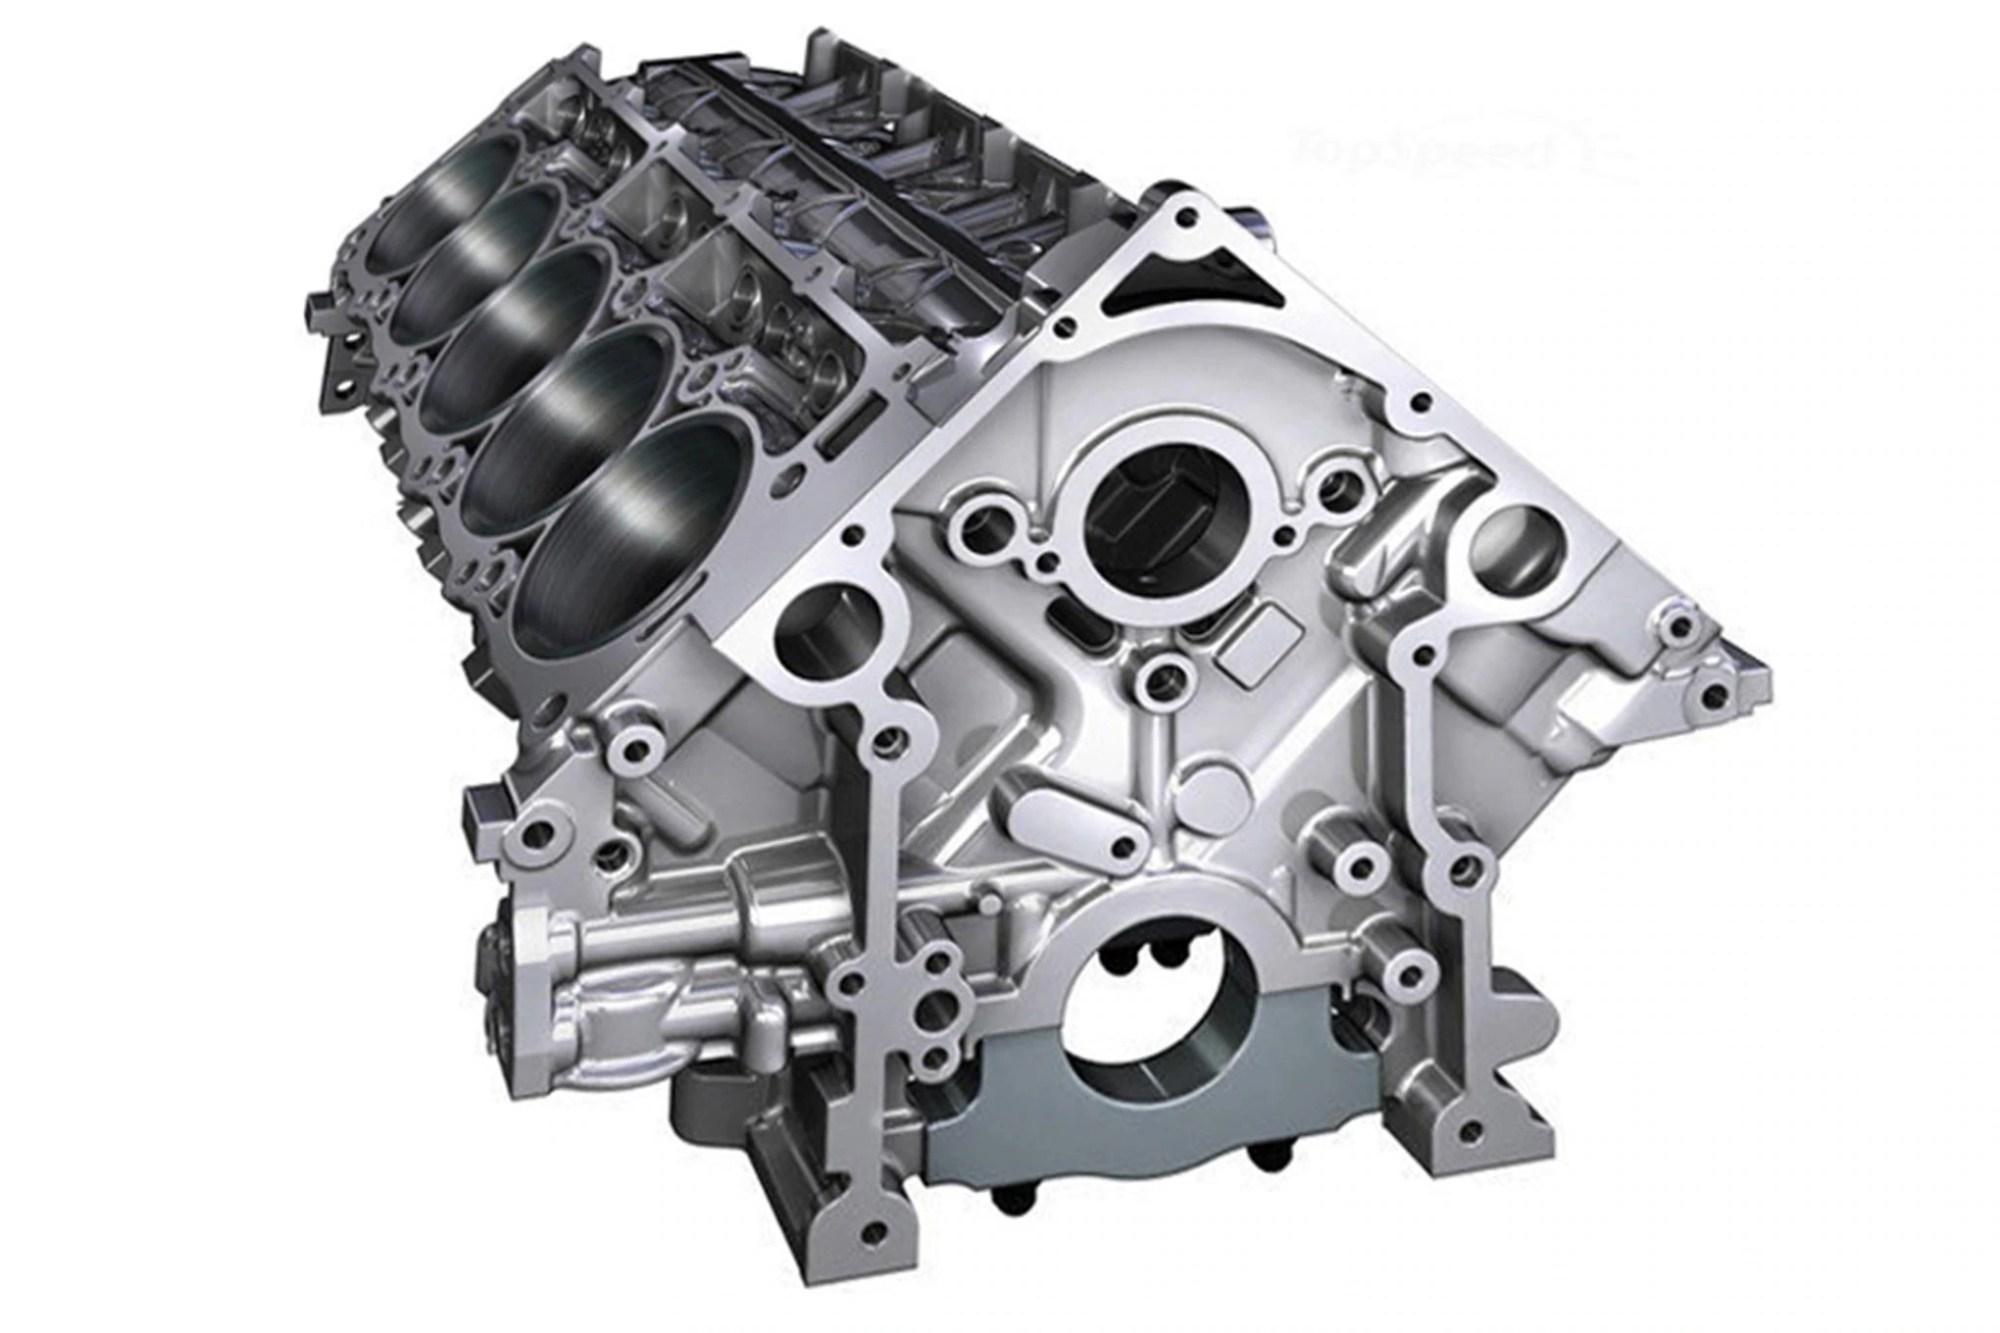 hight resolution of 6 4l hemi engine diagram